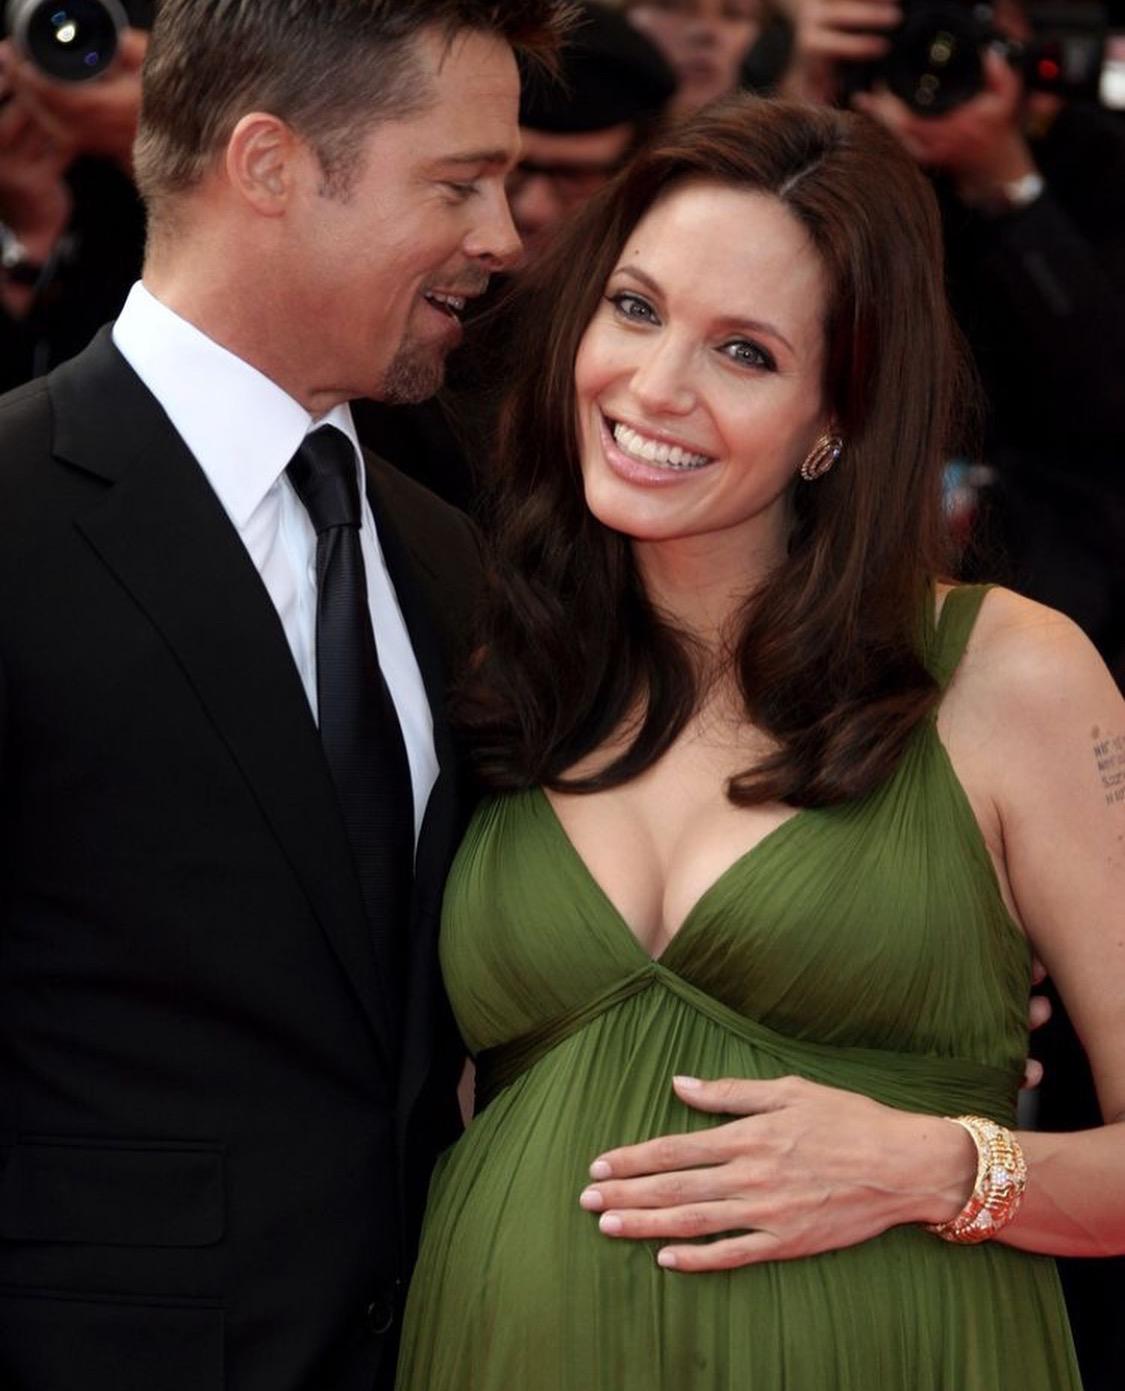 Brad Pitt is confident he will win Joint Custody